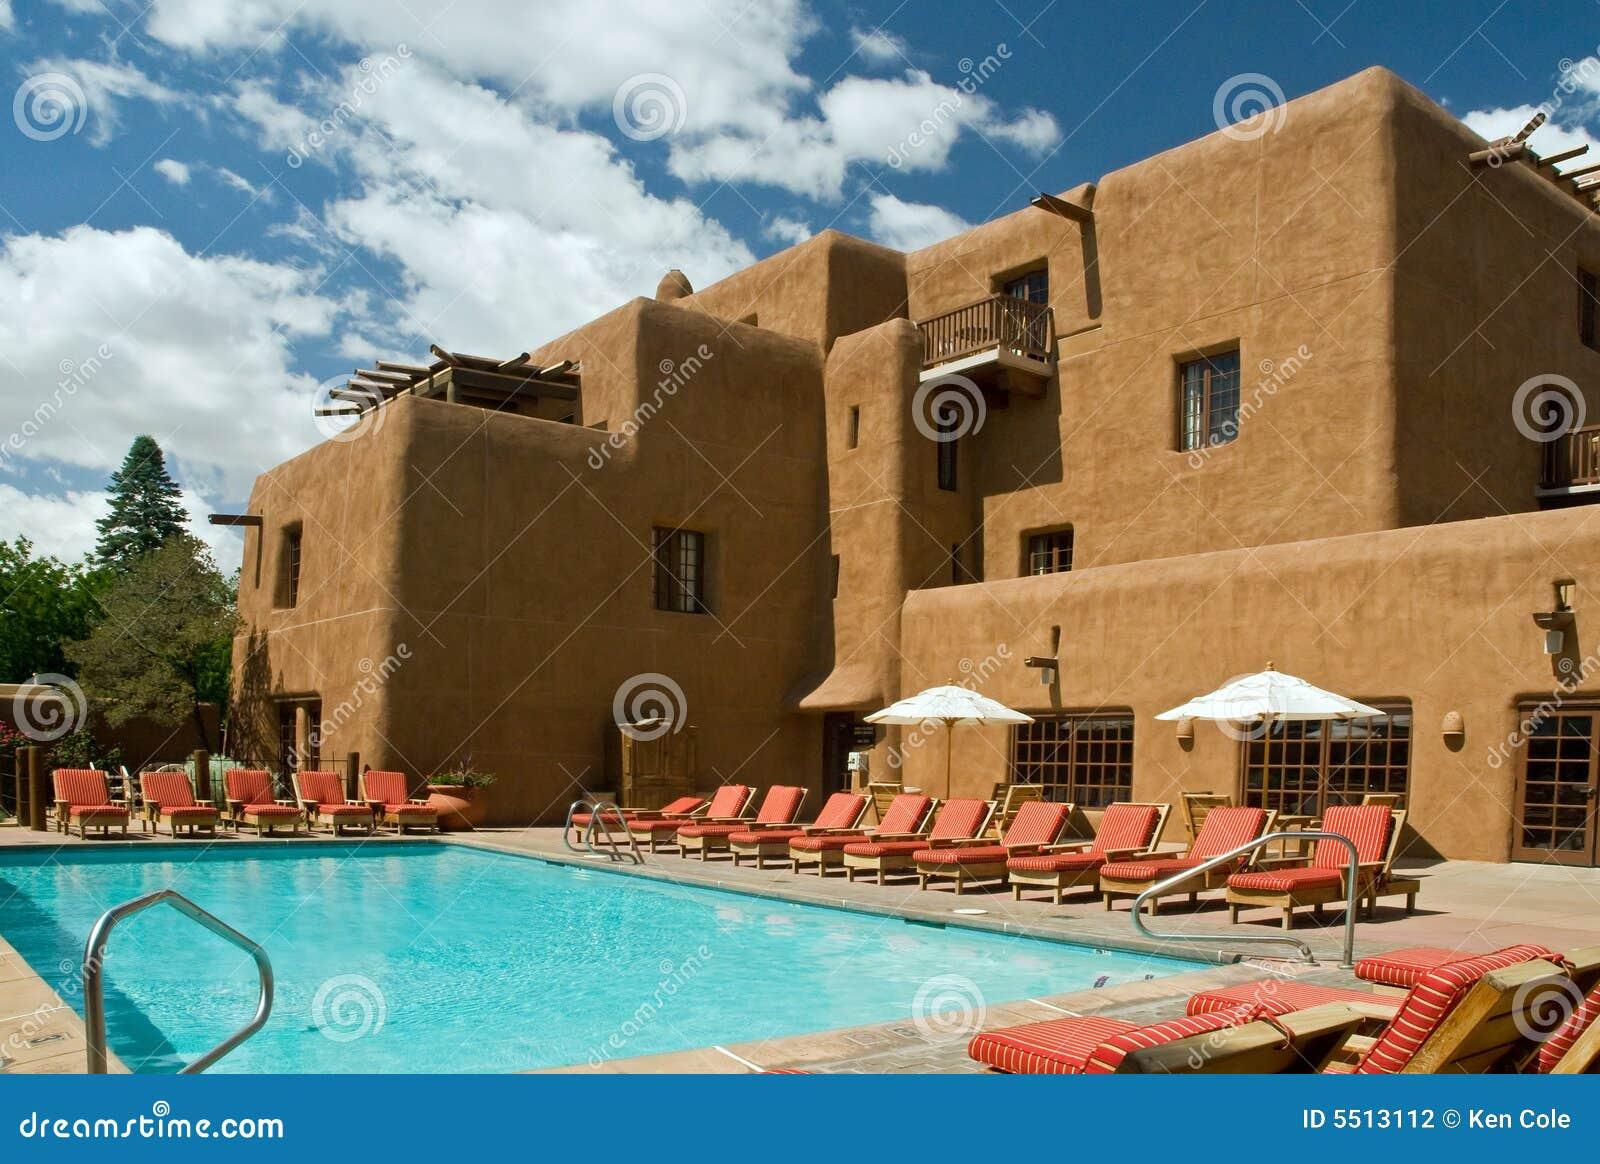 New Mexico resort hotel